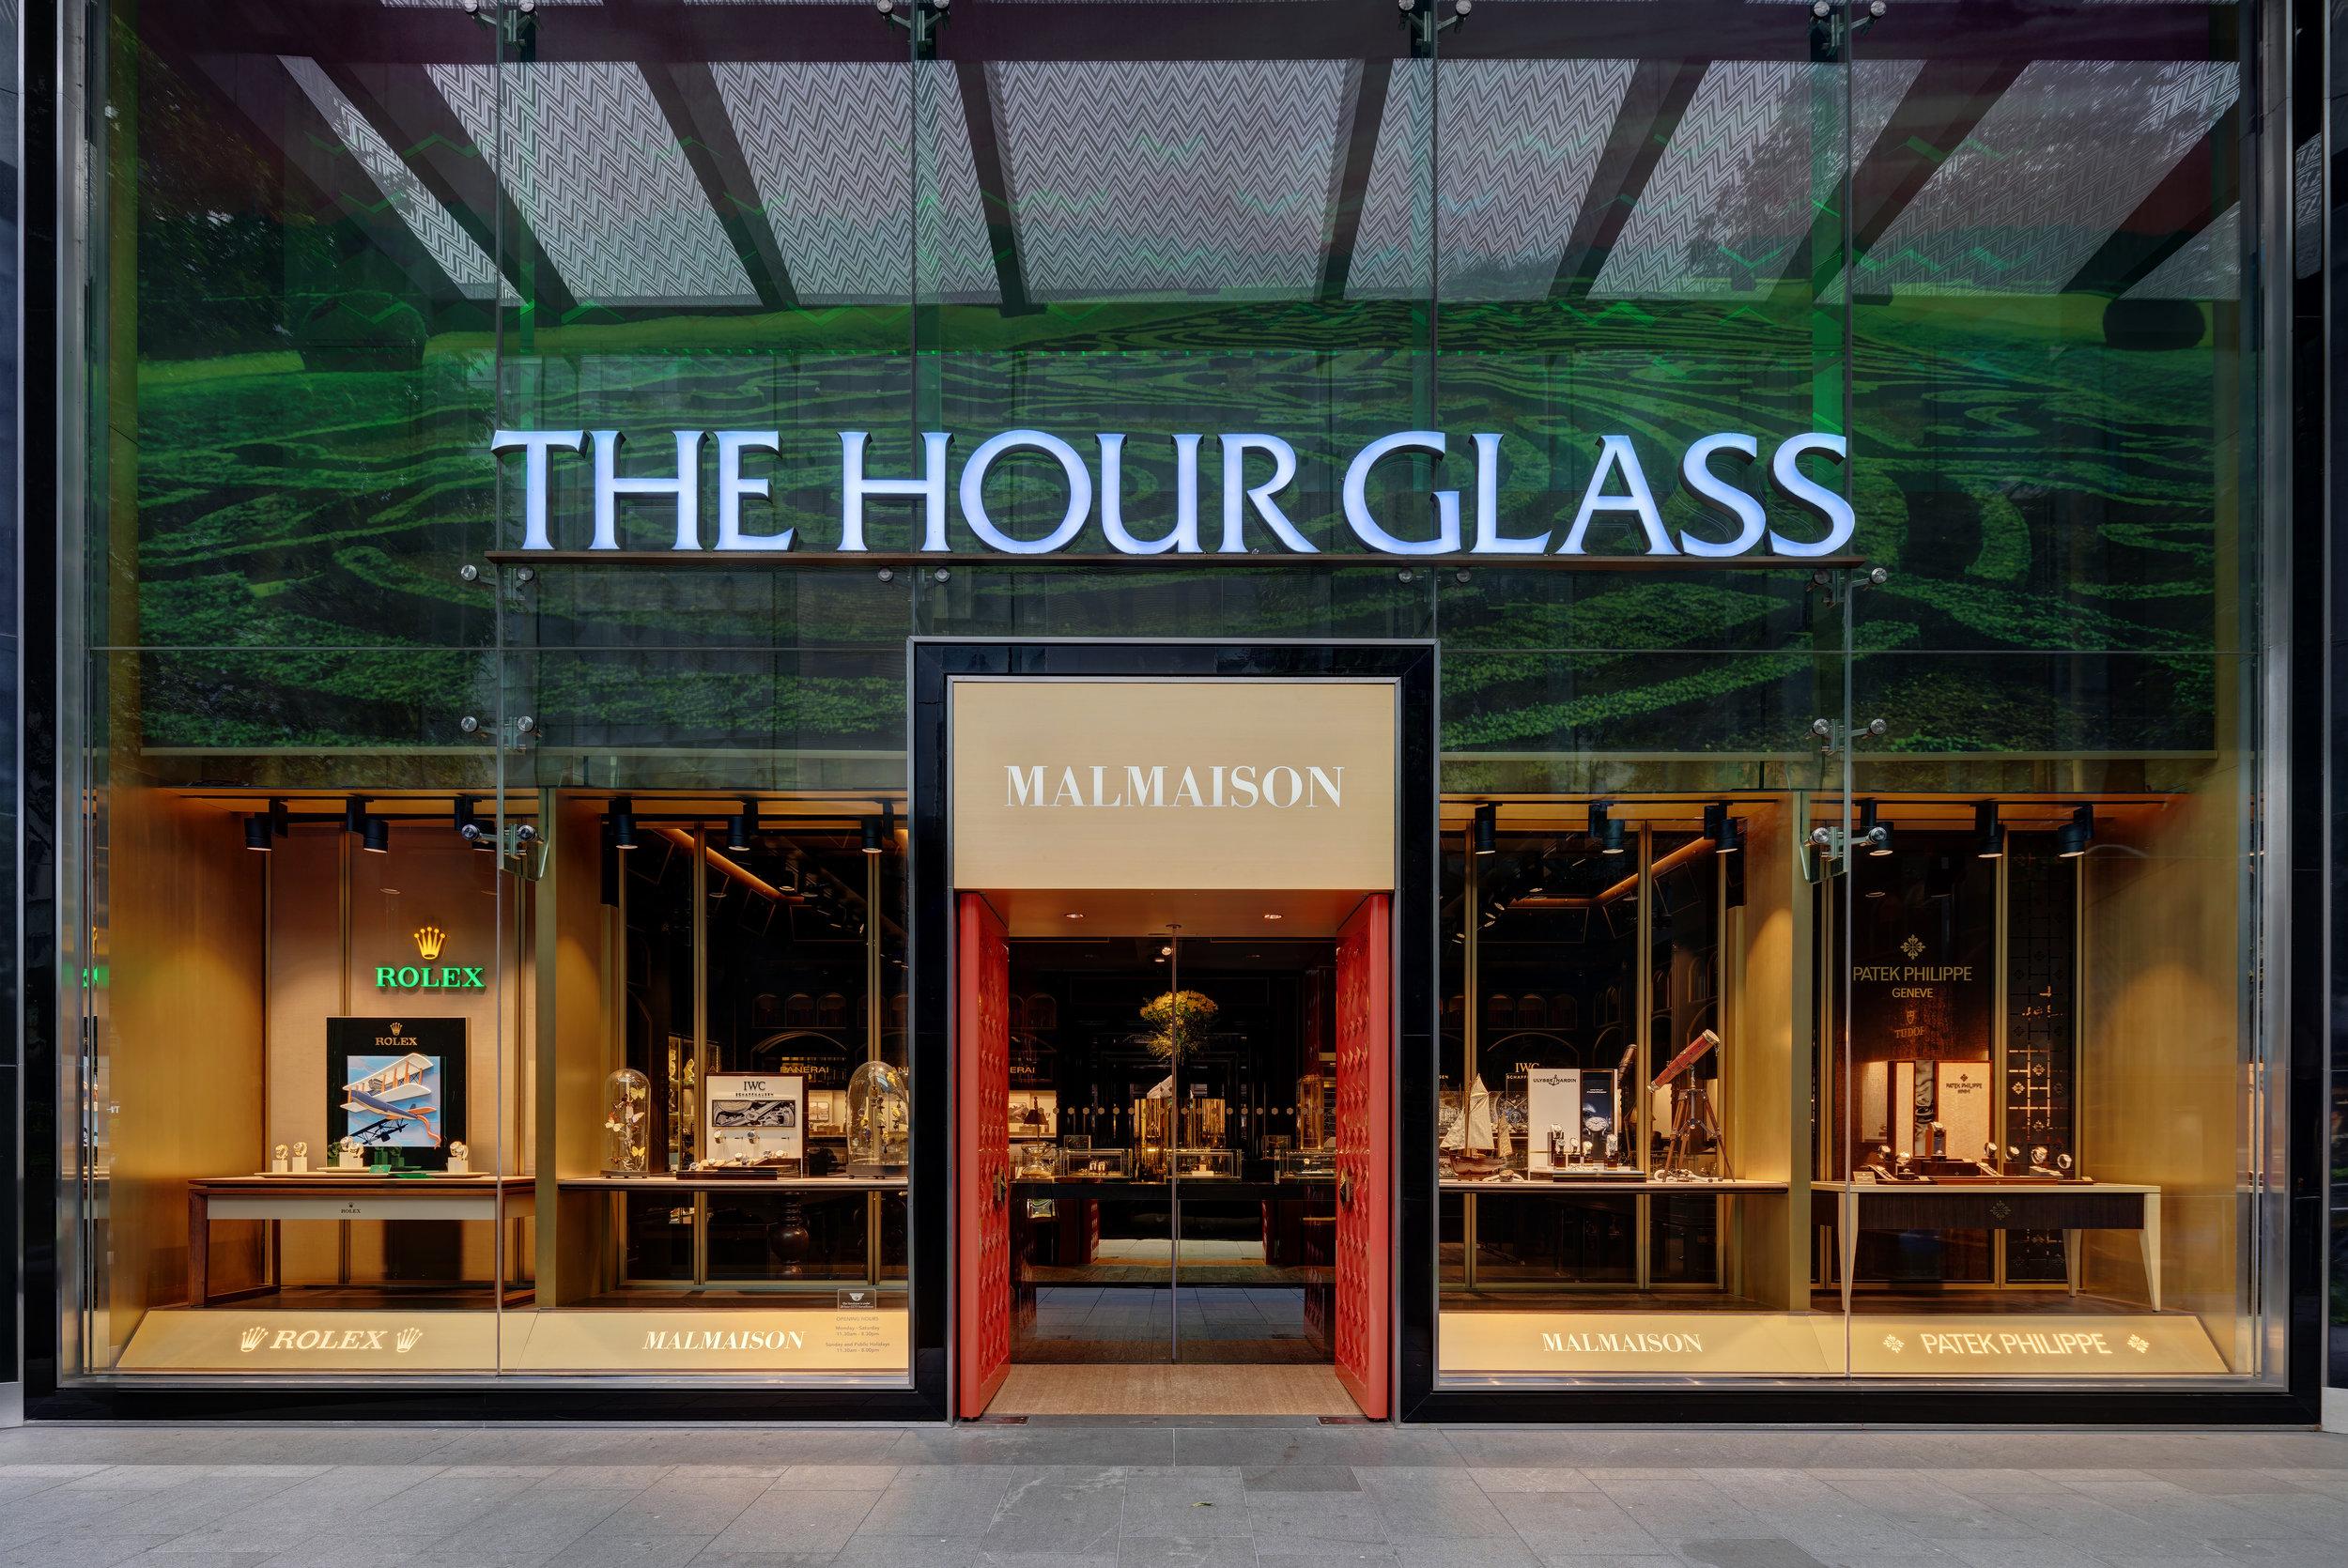 Hour Glass - Malmaison.jpg